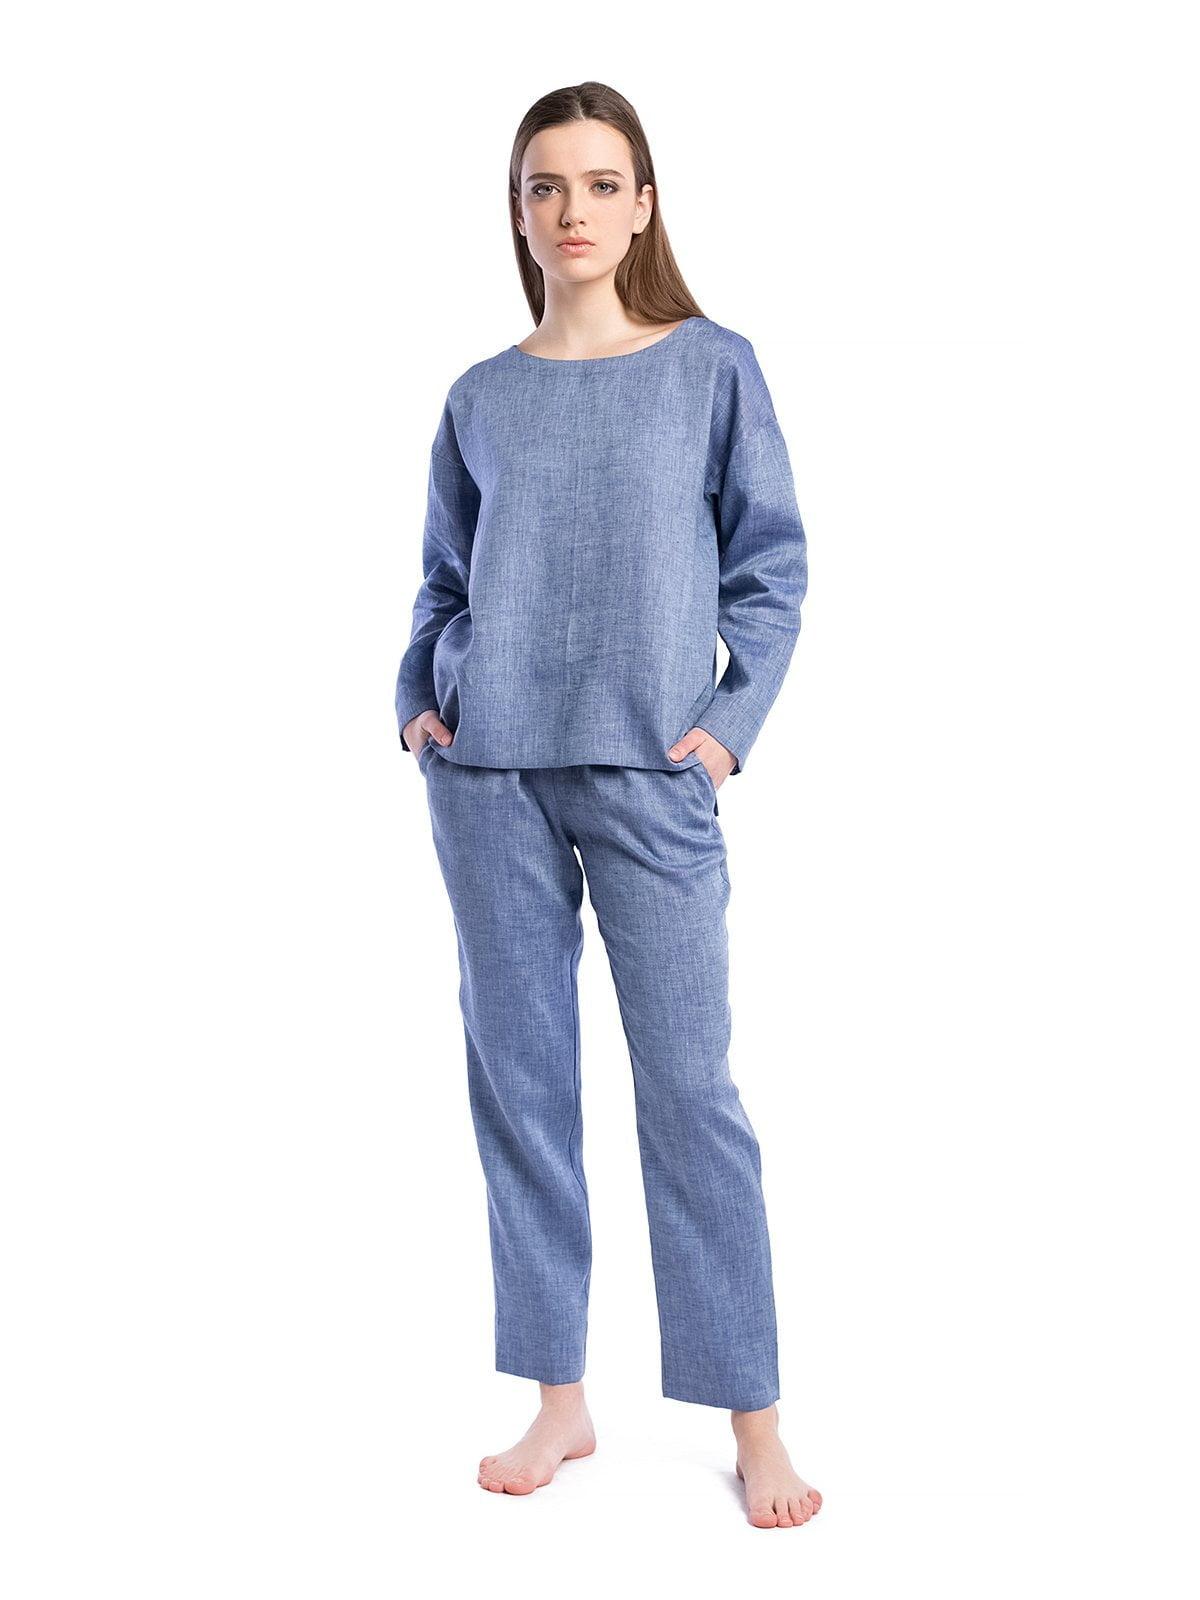 Women s pajamas Sky – buy in Kiev and Ukraine  b05ffae50b1d9